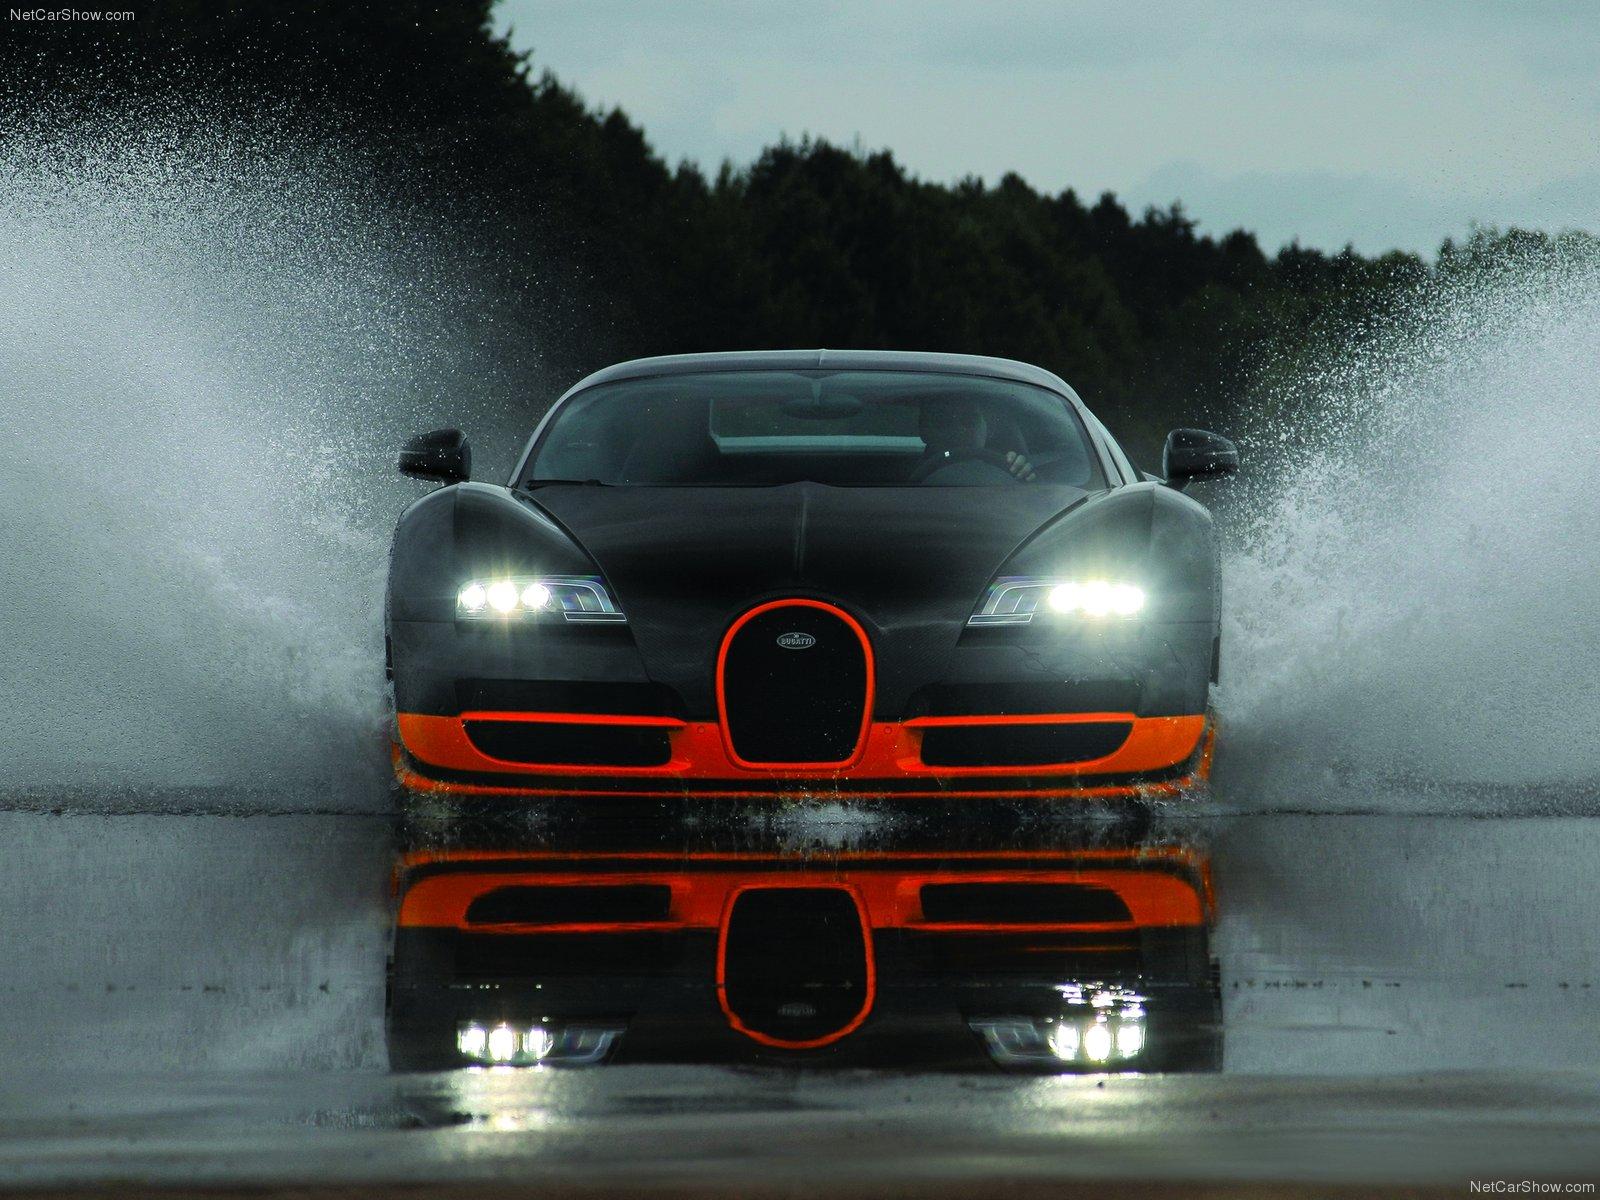 77 Bugatti Veyron Wallpapers On Wallpapersafari